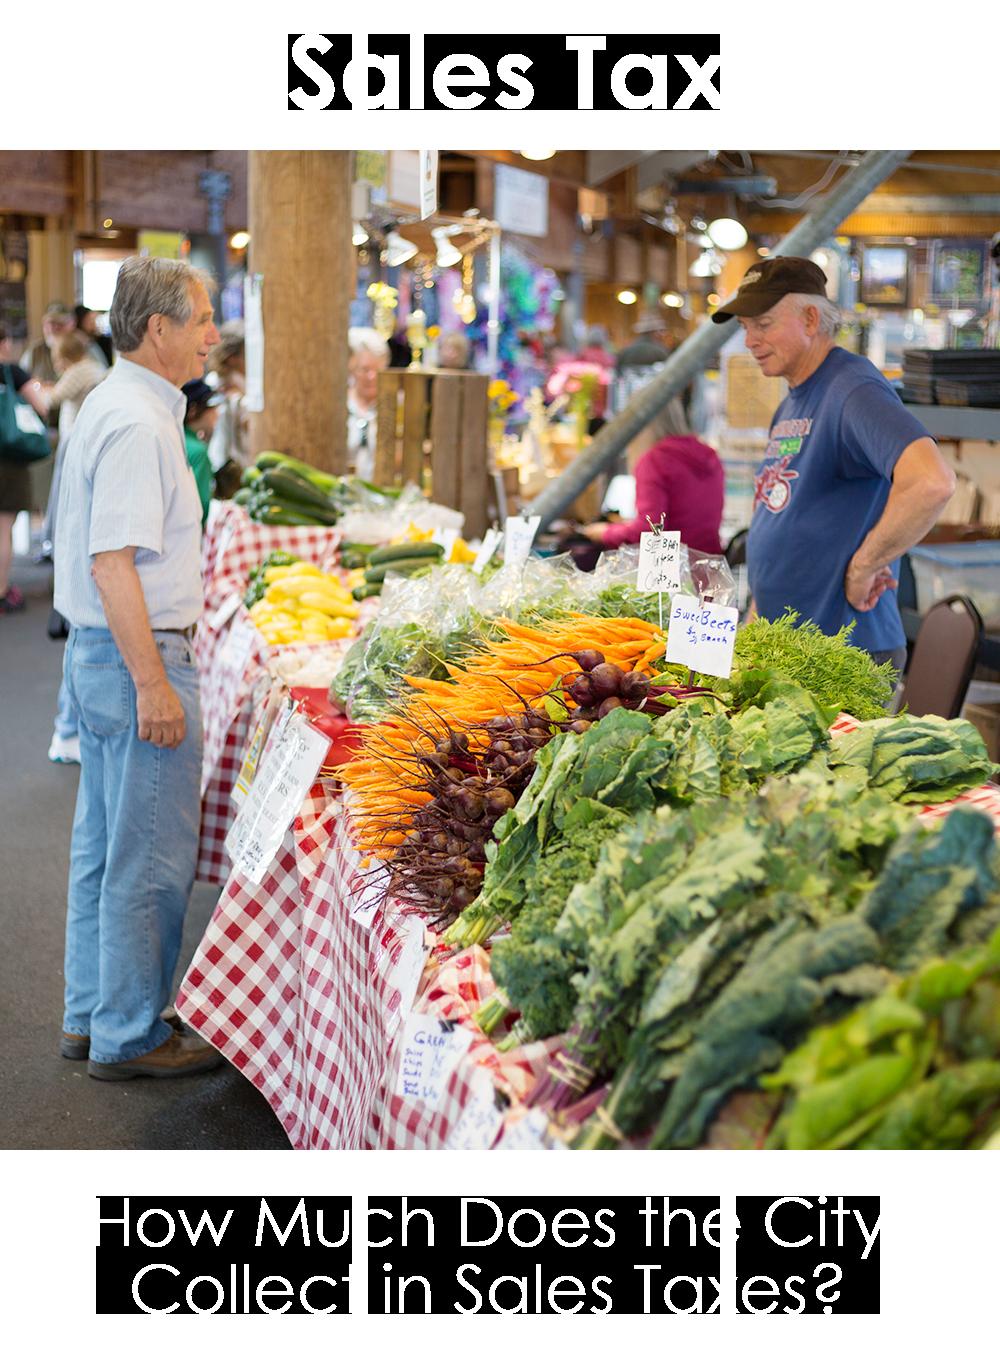 Customer and Vendor at Farmers Market